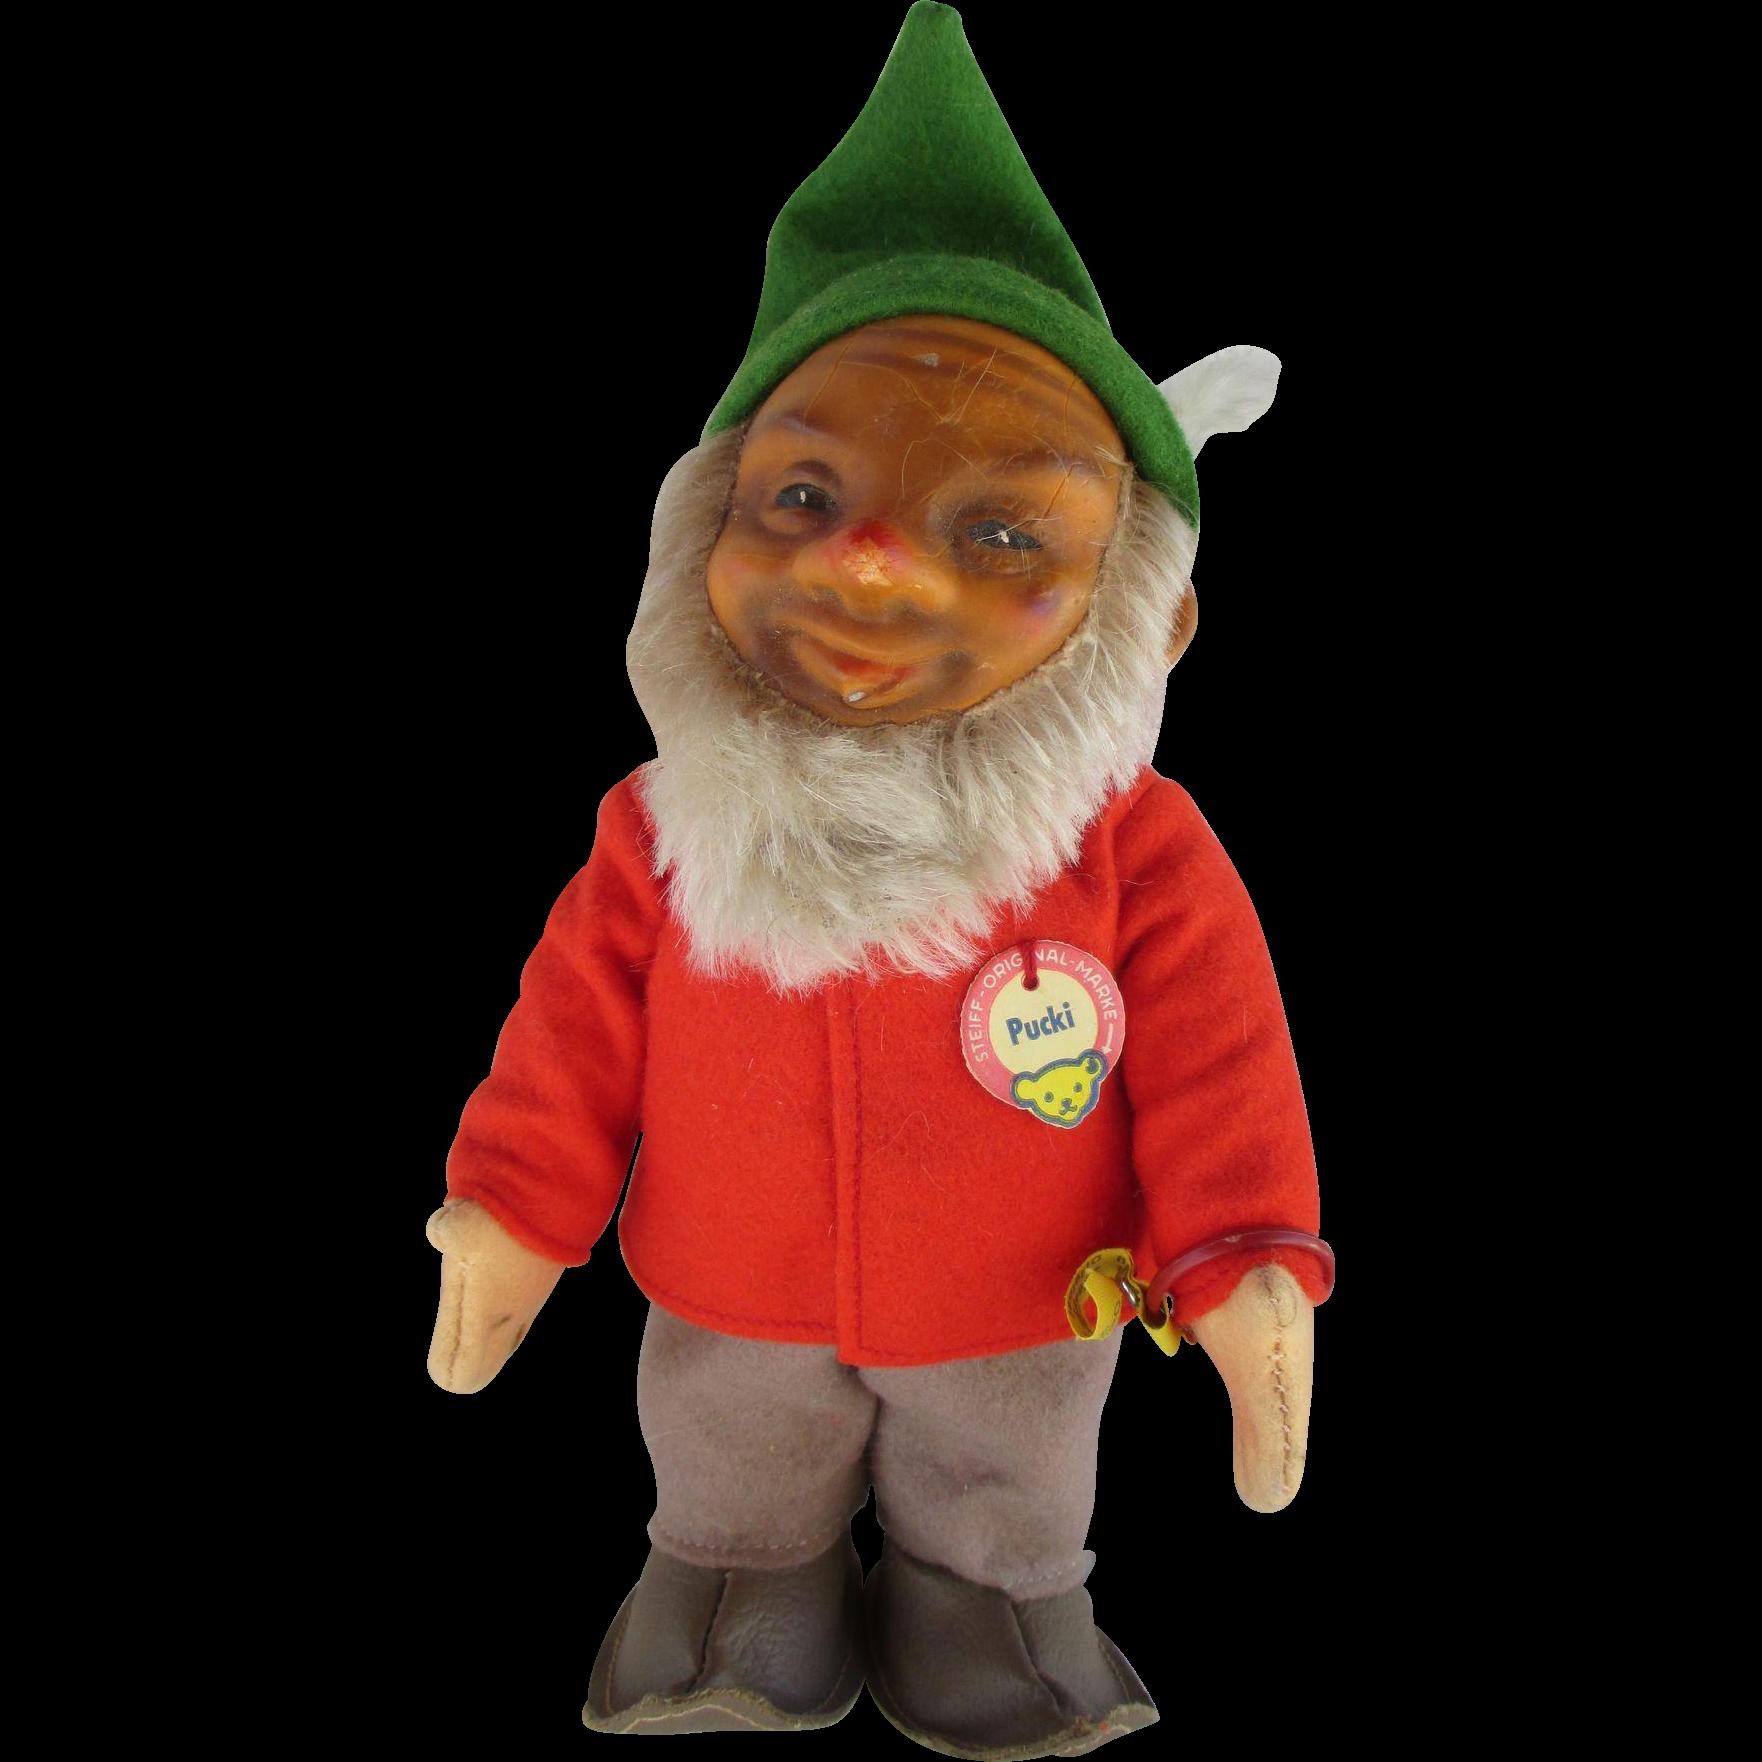 1950's-1960's Steiff Pucki Gnome Elf Doll